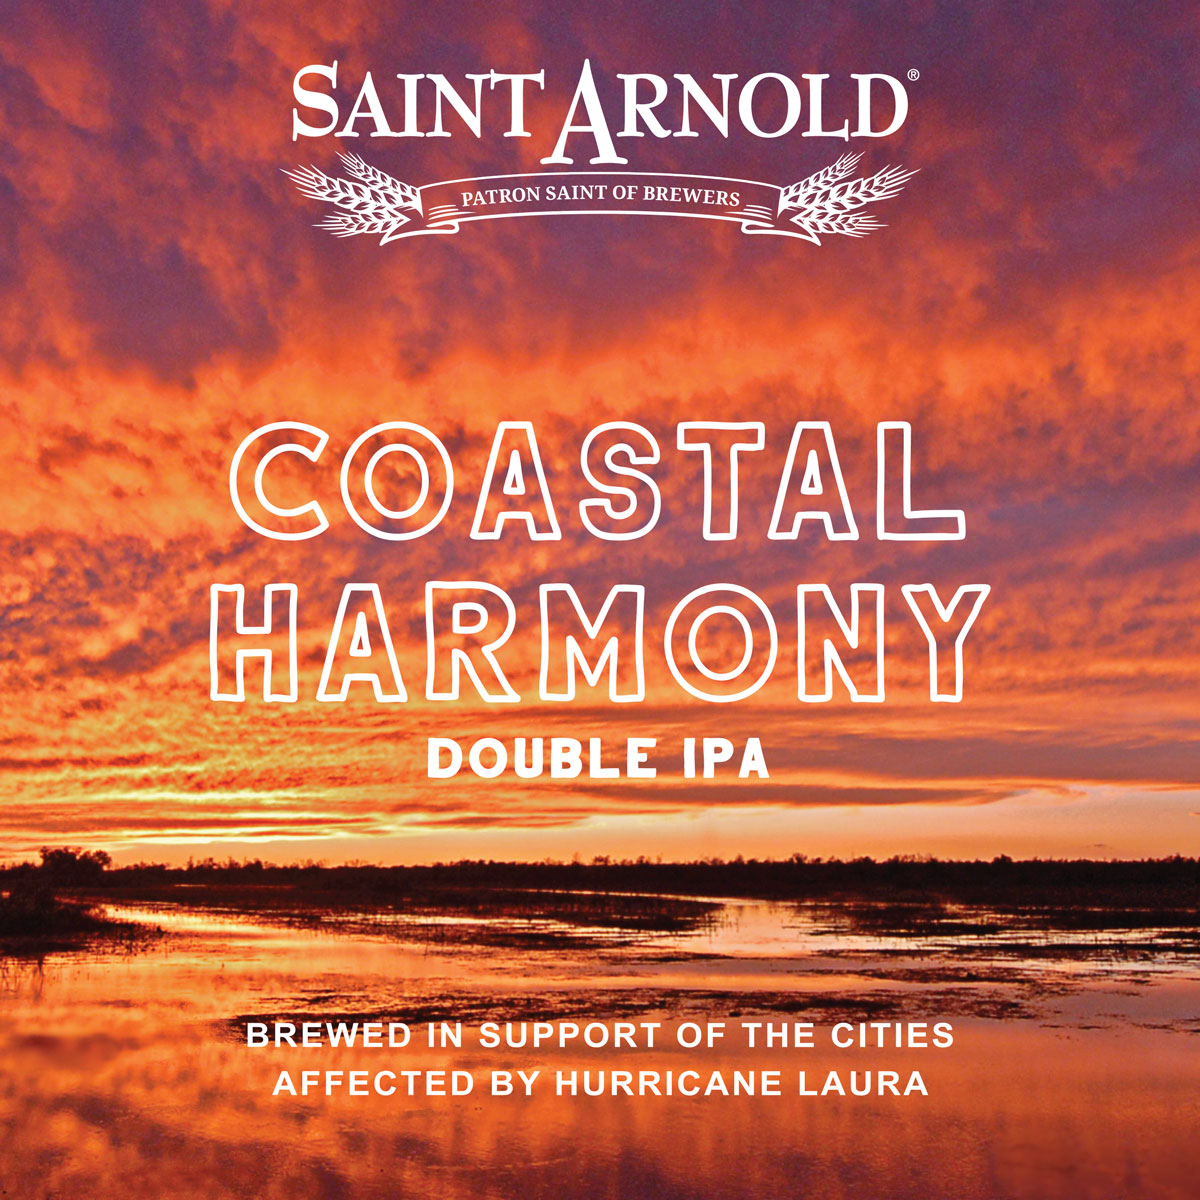 brand_image_coastal_harmony